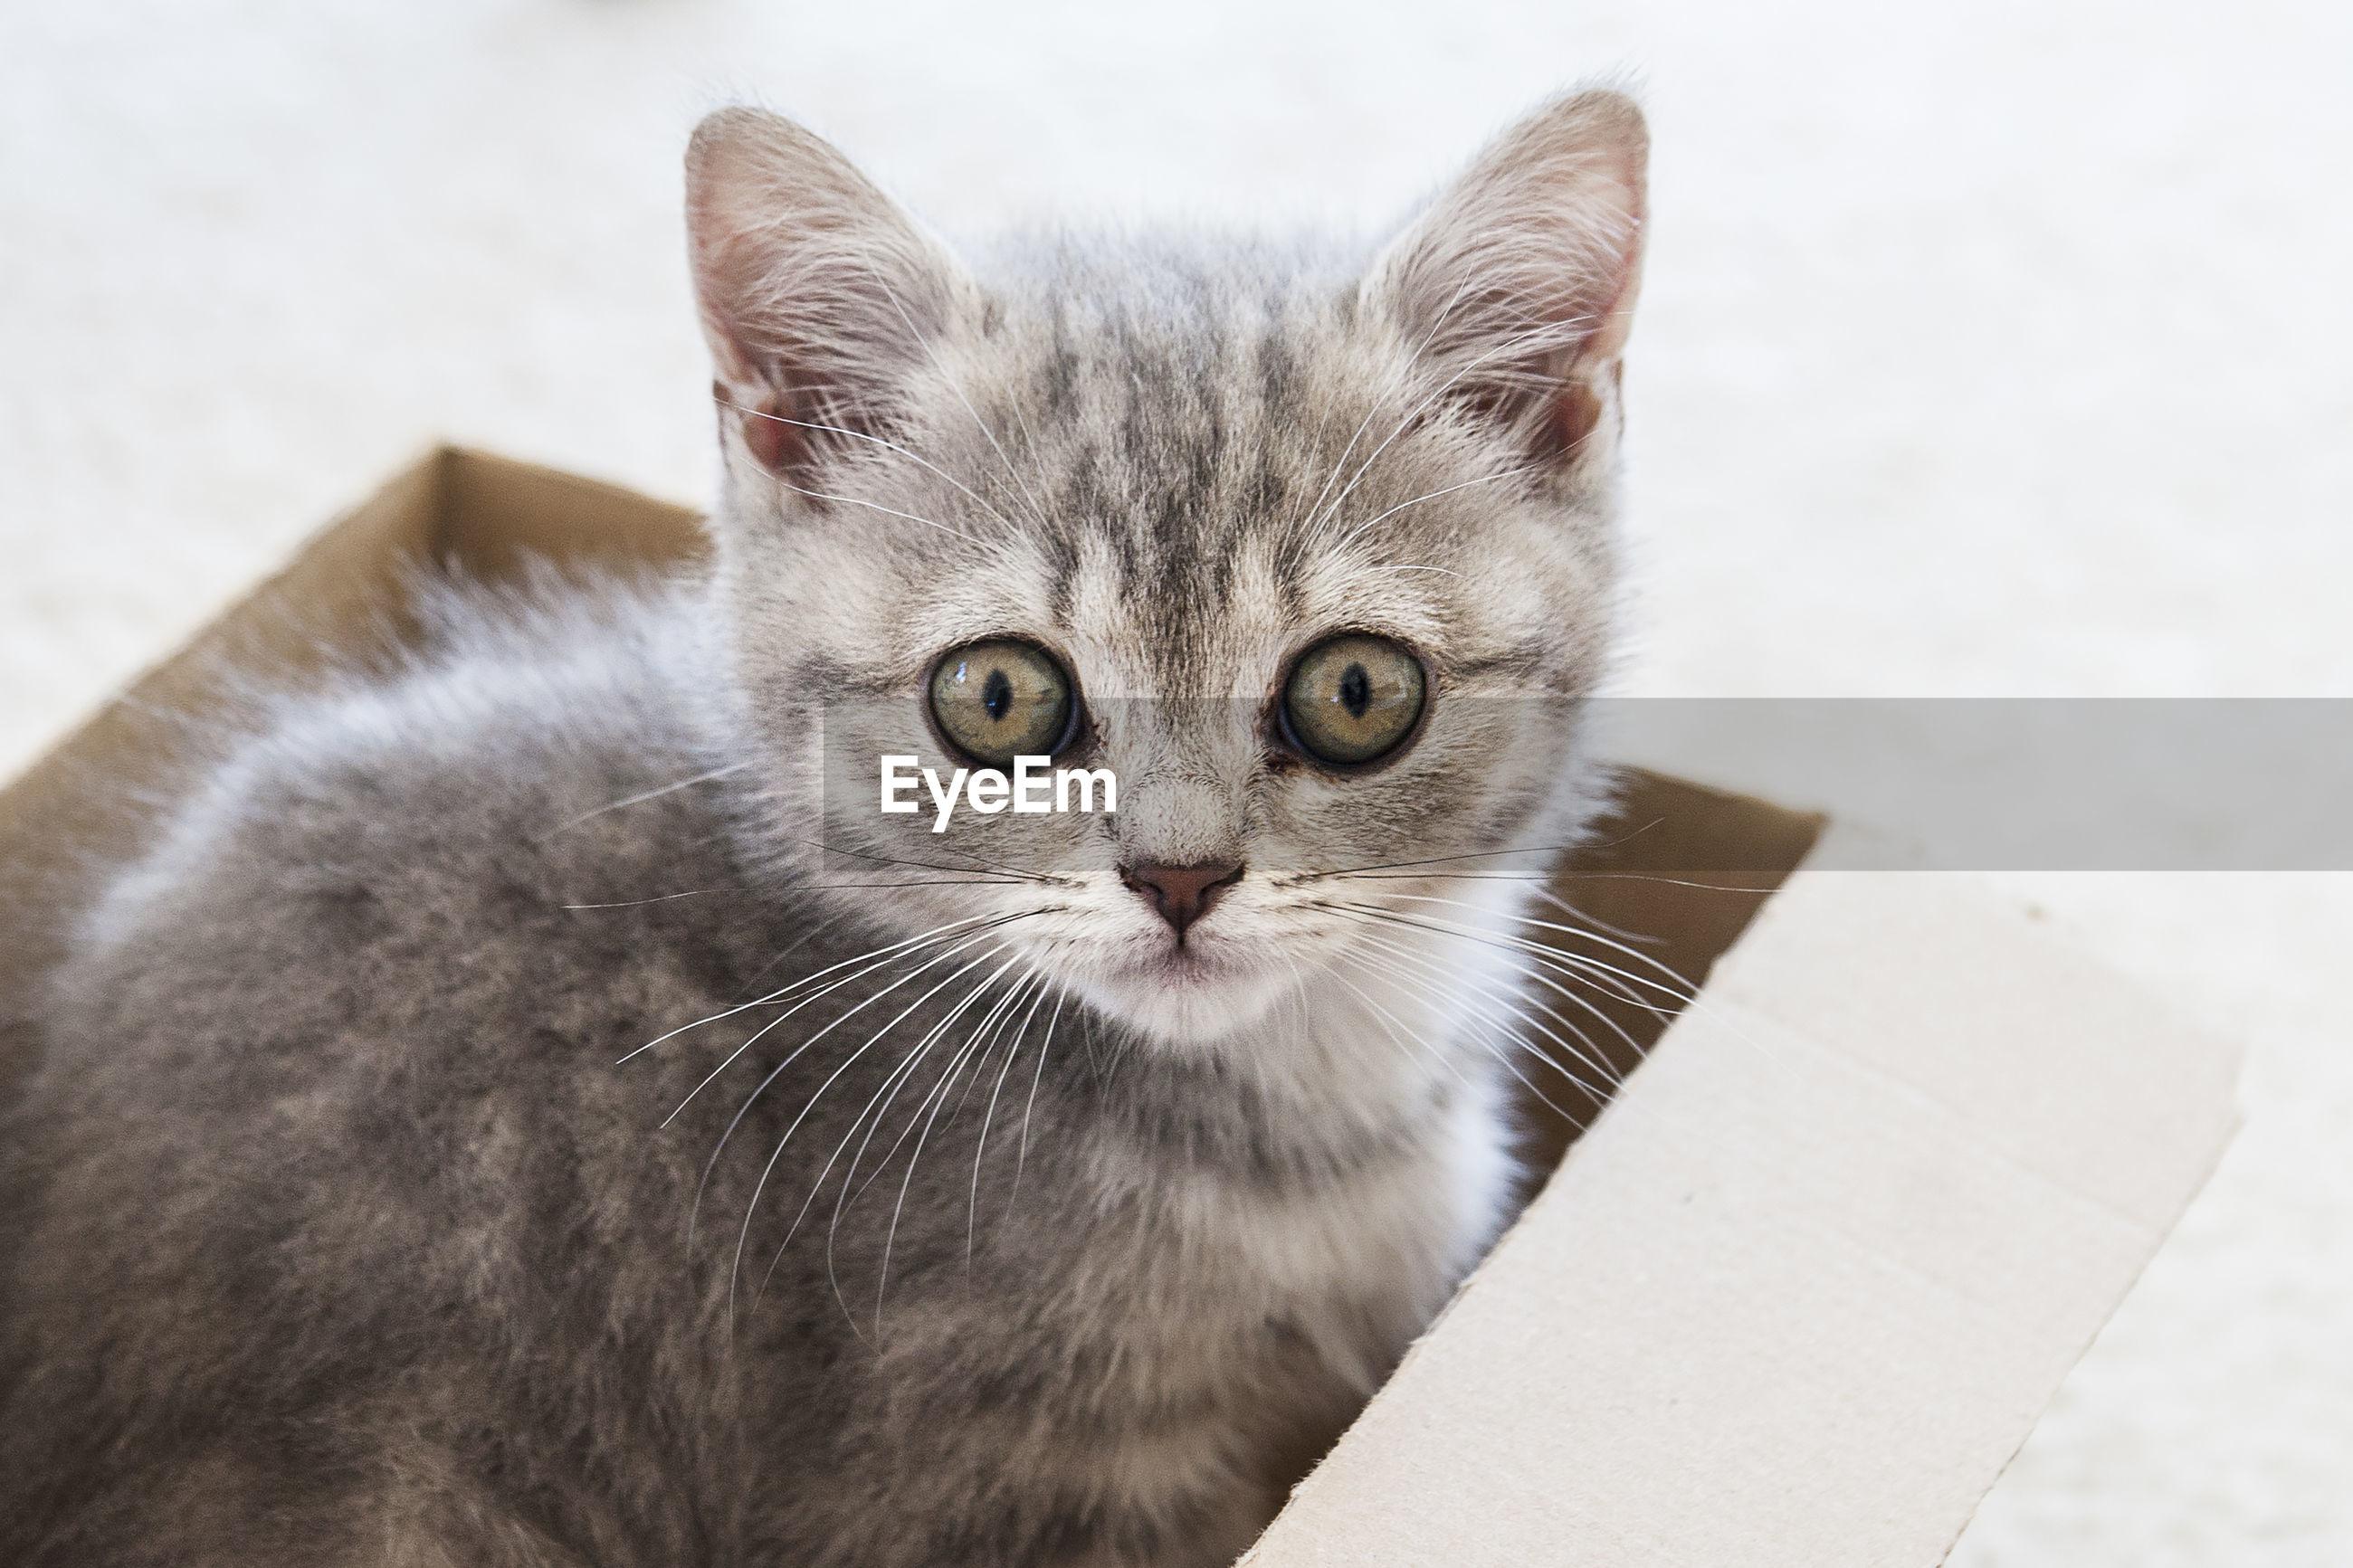 CLOSE-UP PORTRAIT OF CAT IN BATHTUB